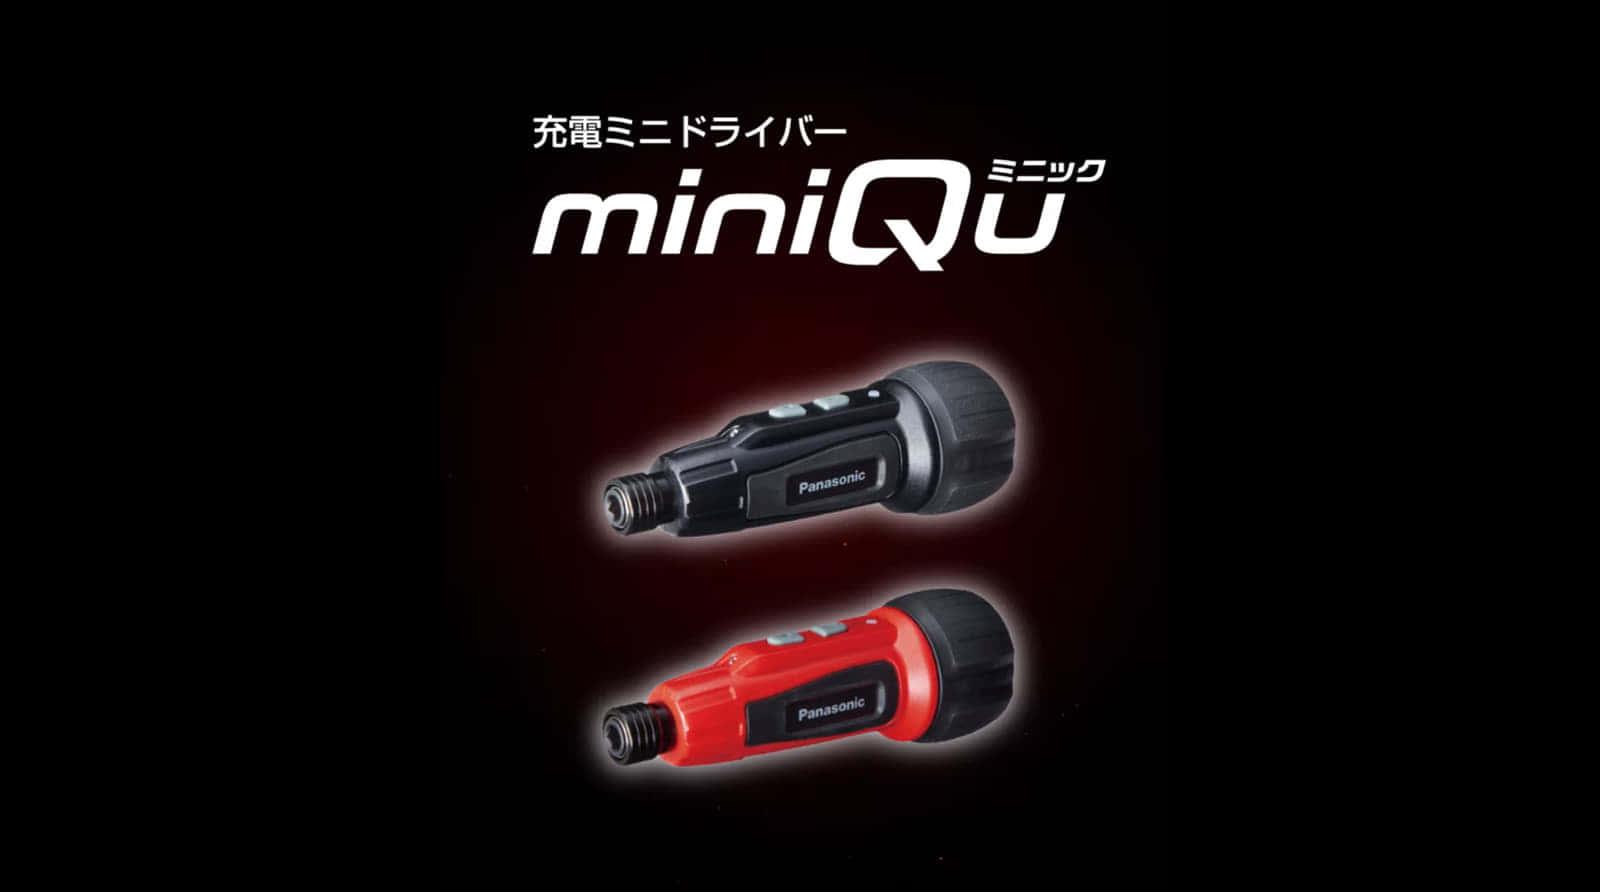 Panasonic  miniQu 充電式ボールグリップドライバー、業界トップクラスの小型モデル